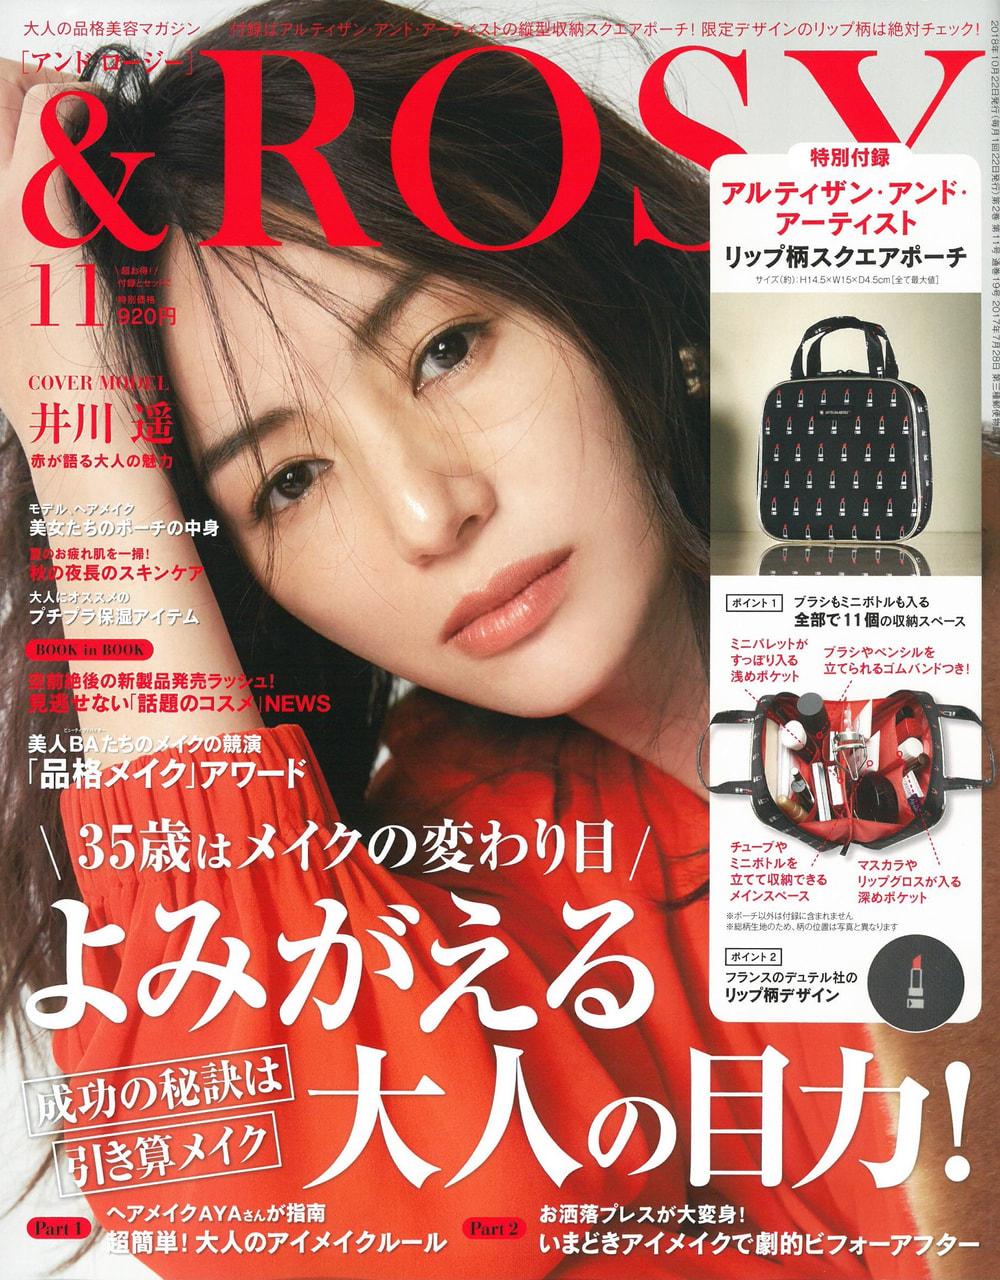 &ROSY11月号(2018.09.22発売)